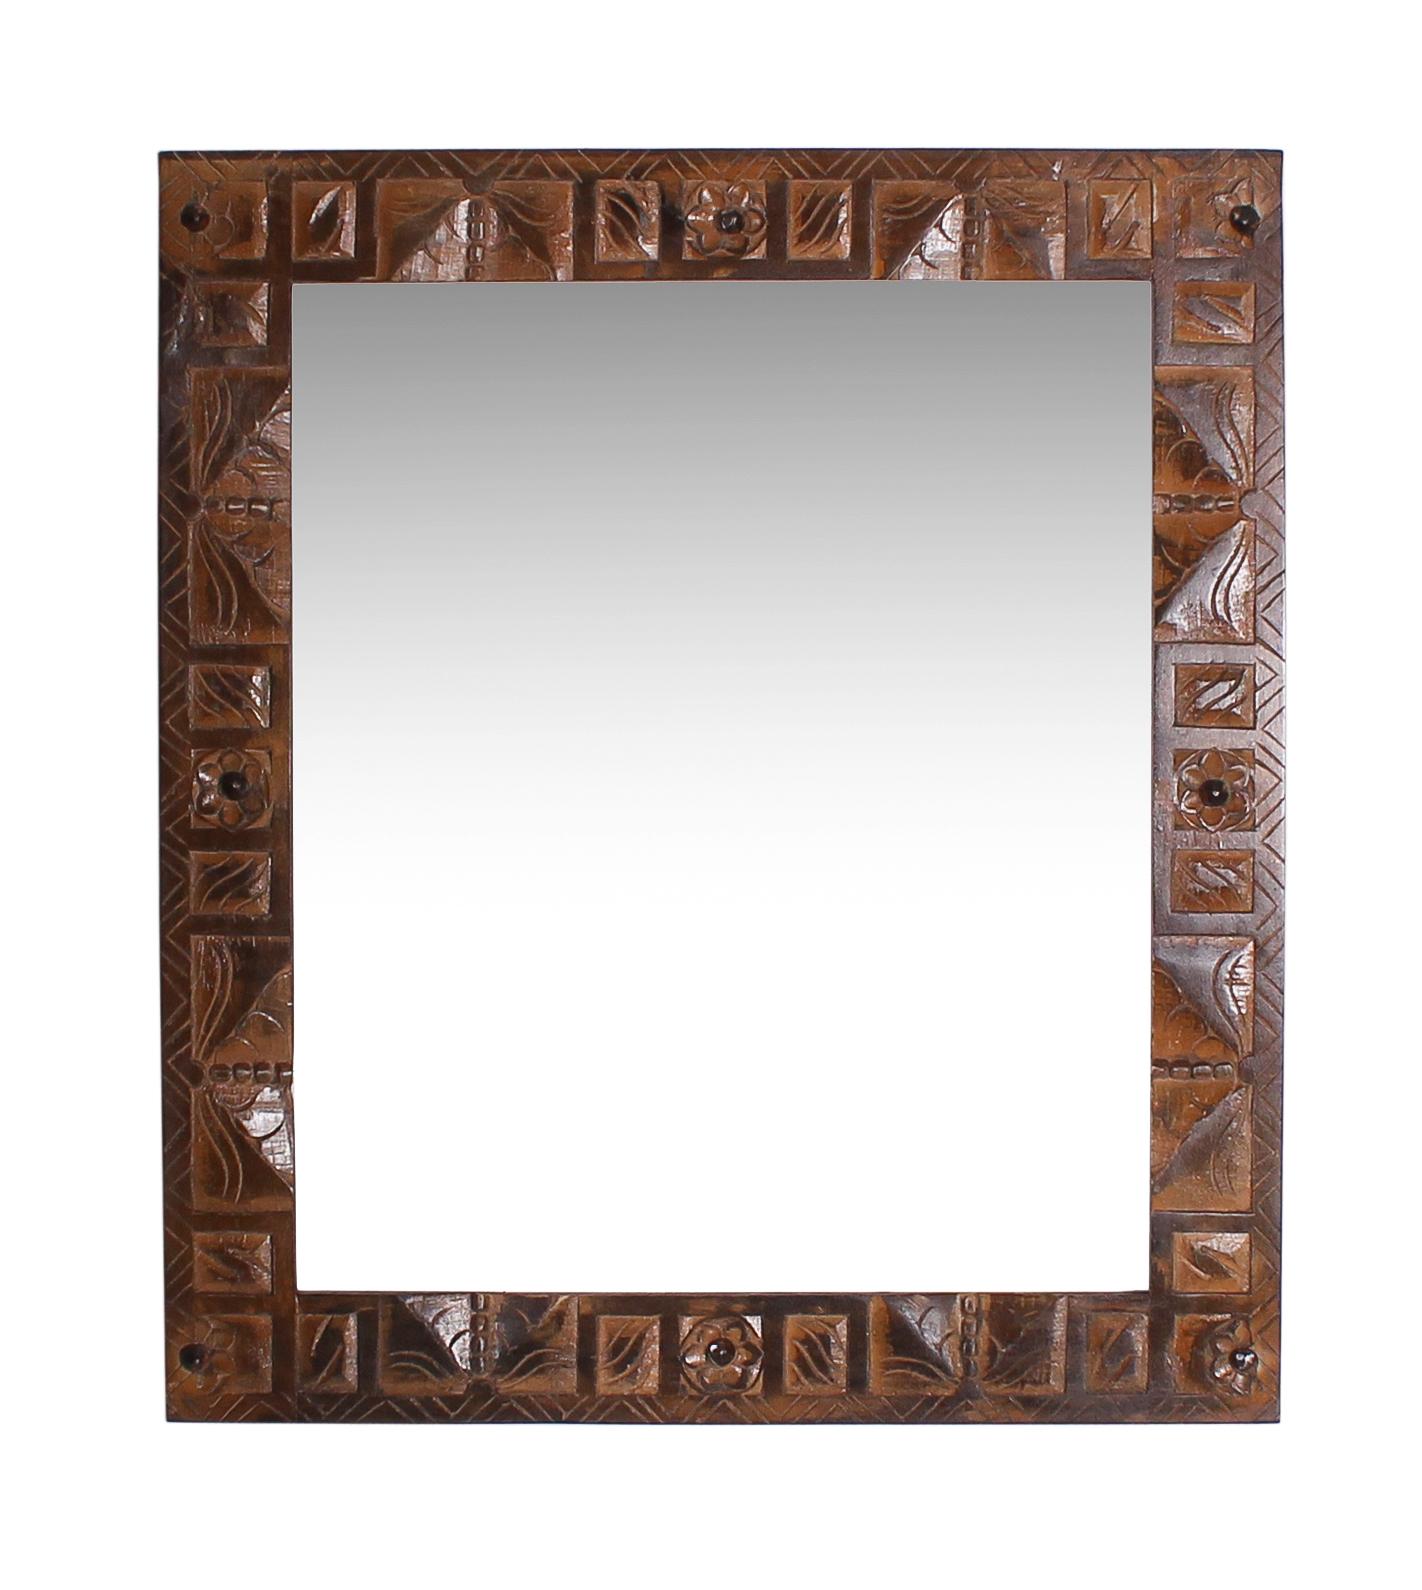 Sit Wandspiegel Almirah im kolonial Stil recycelt